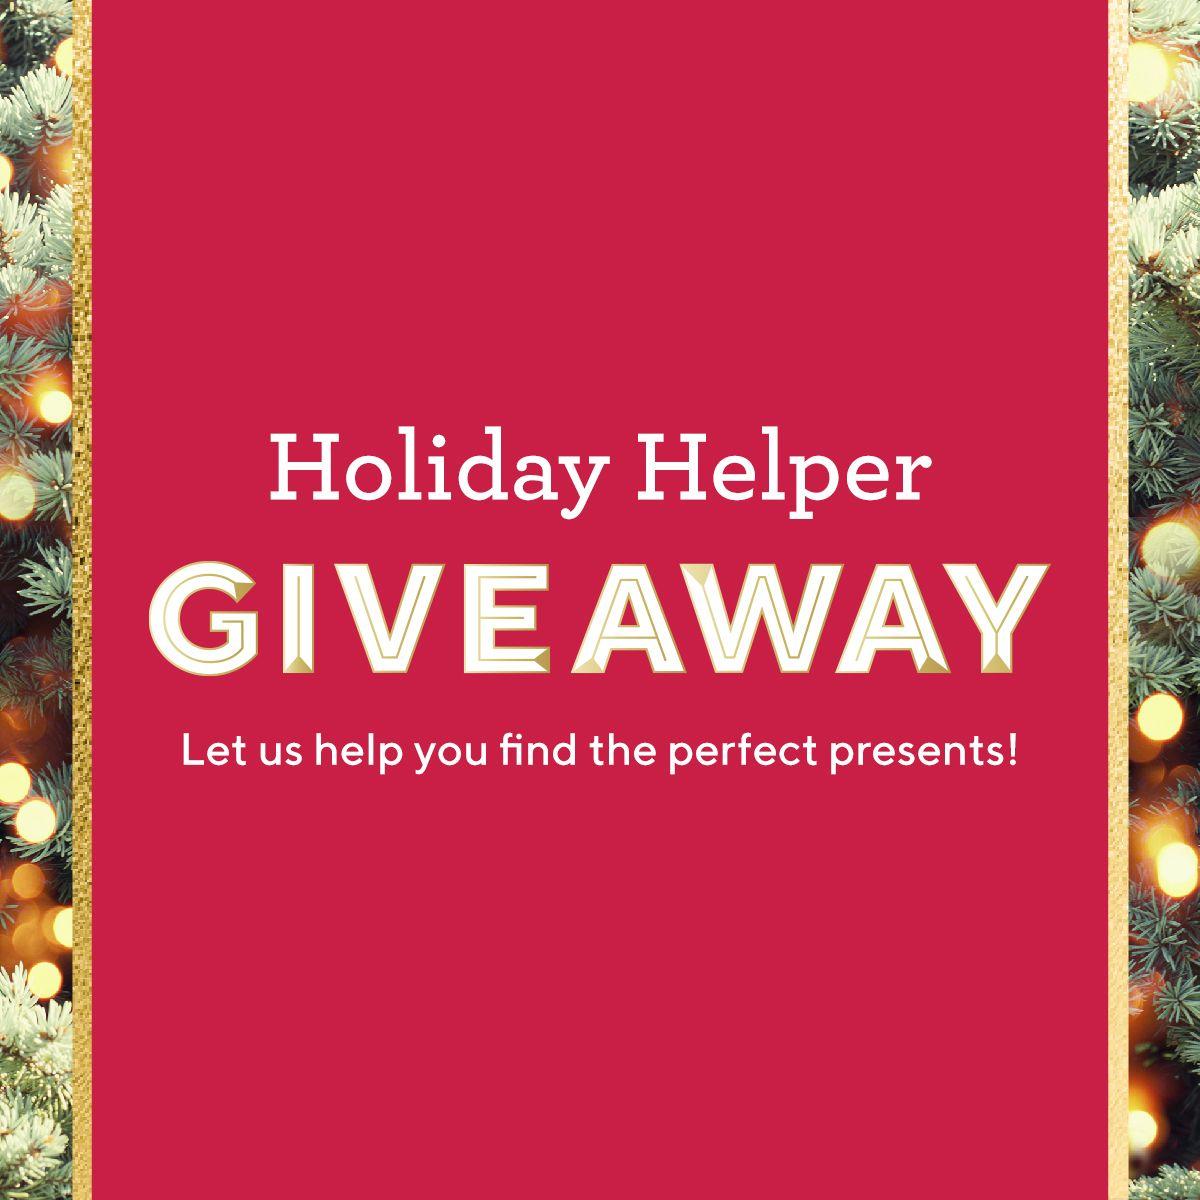 FB_HolidayHelperGiveaway.jpg